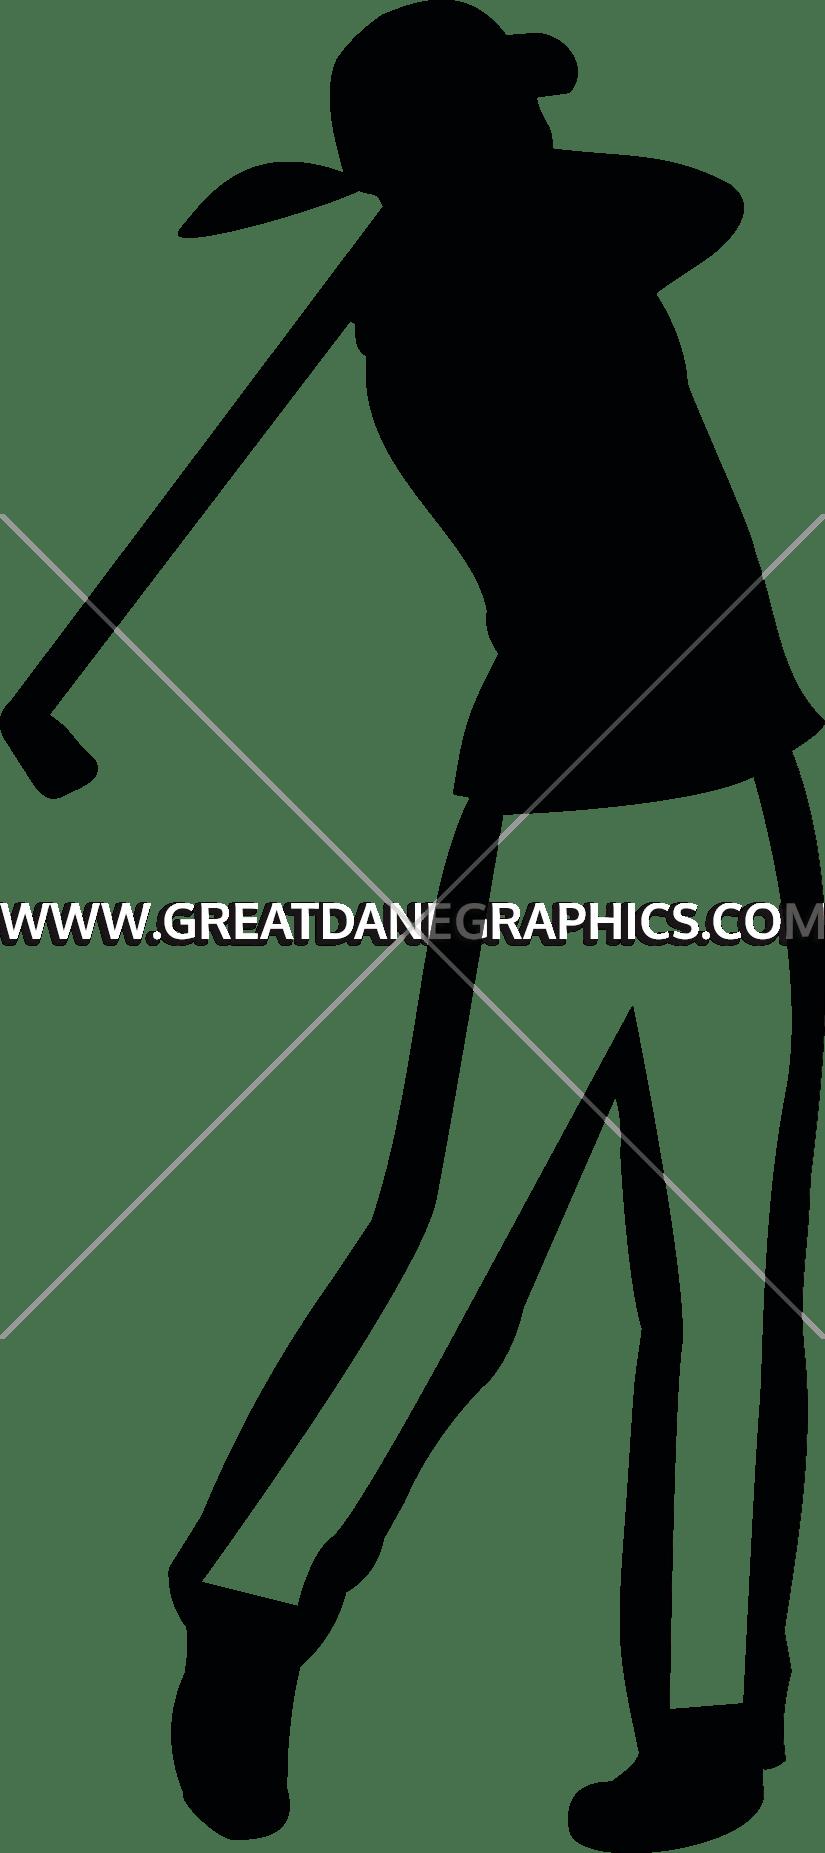 Golf clipart artwork. Female silhouette at getdrawings